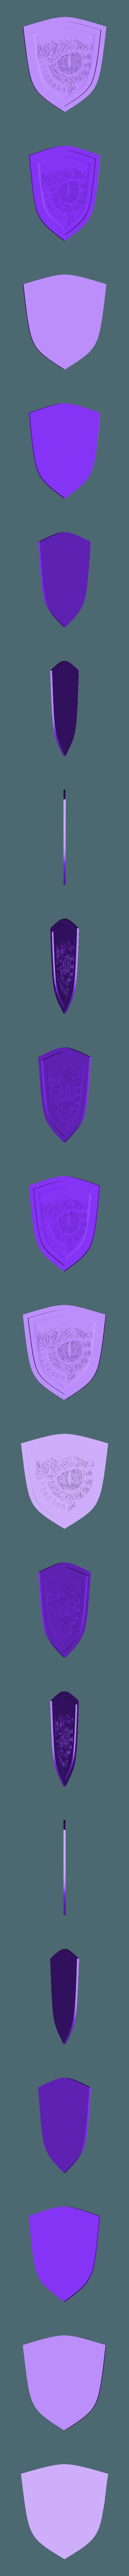 oeil_odin_V2.stl Télécharger fichier STL gratuit Oeil d'Odin - Odin's Eye • Modèle imprimable en 3D, yb__magiic